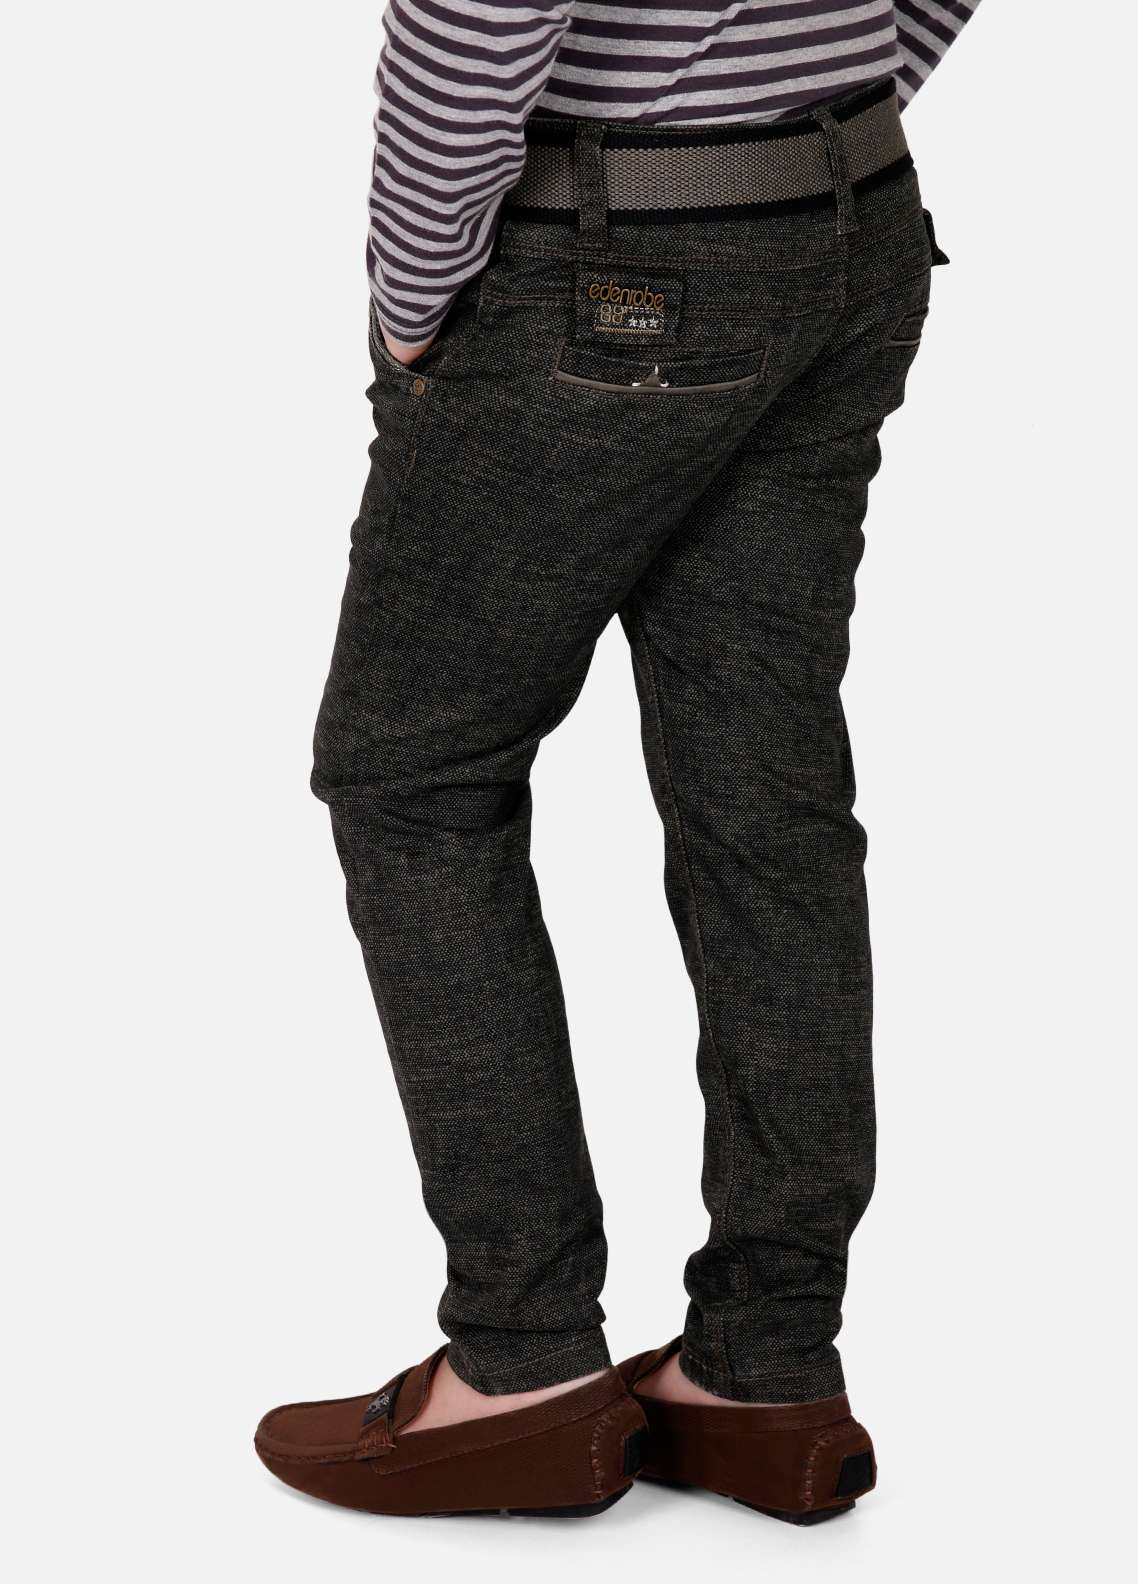 Edenrobe Cotton Plain Texture Boys Pants - Black EDK18P 5719